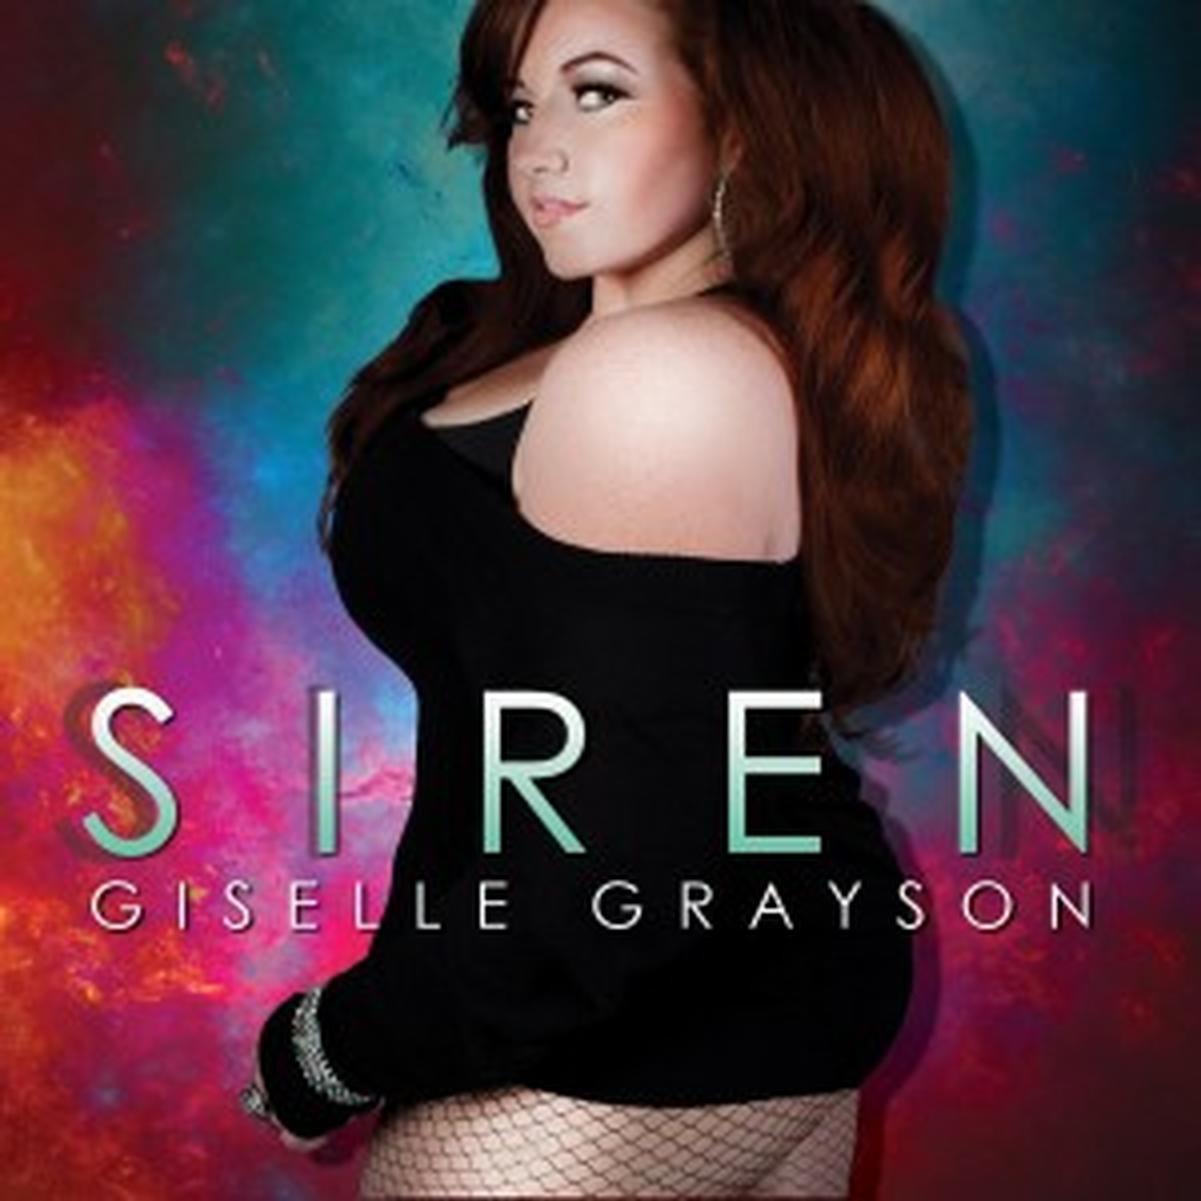 Giselle Grayson